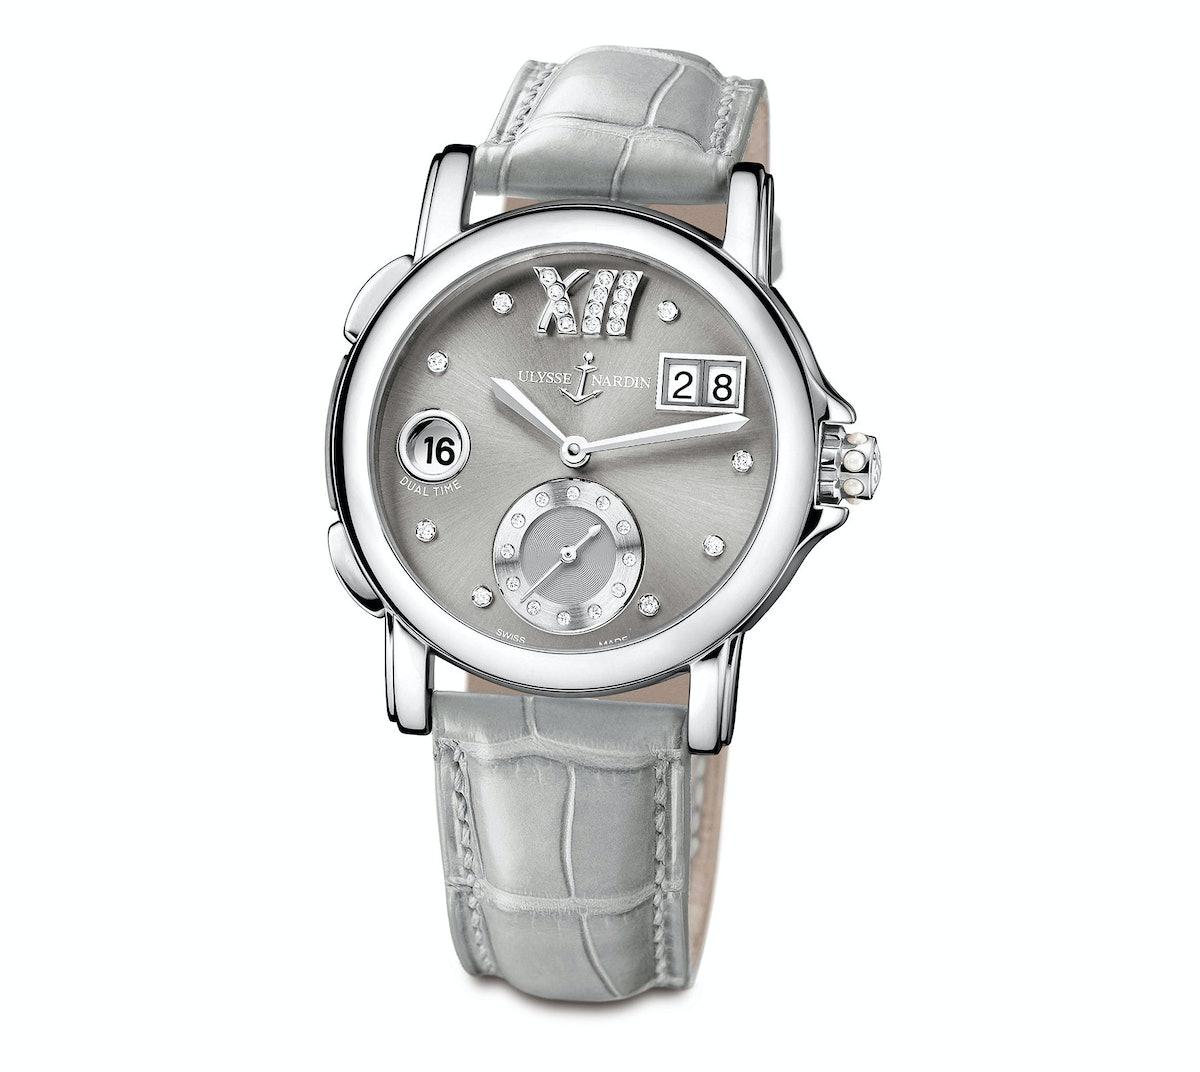 Ulysse Nardin steel and diamond watch